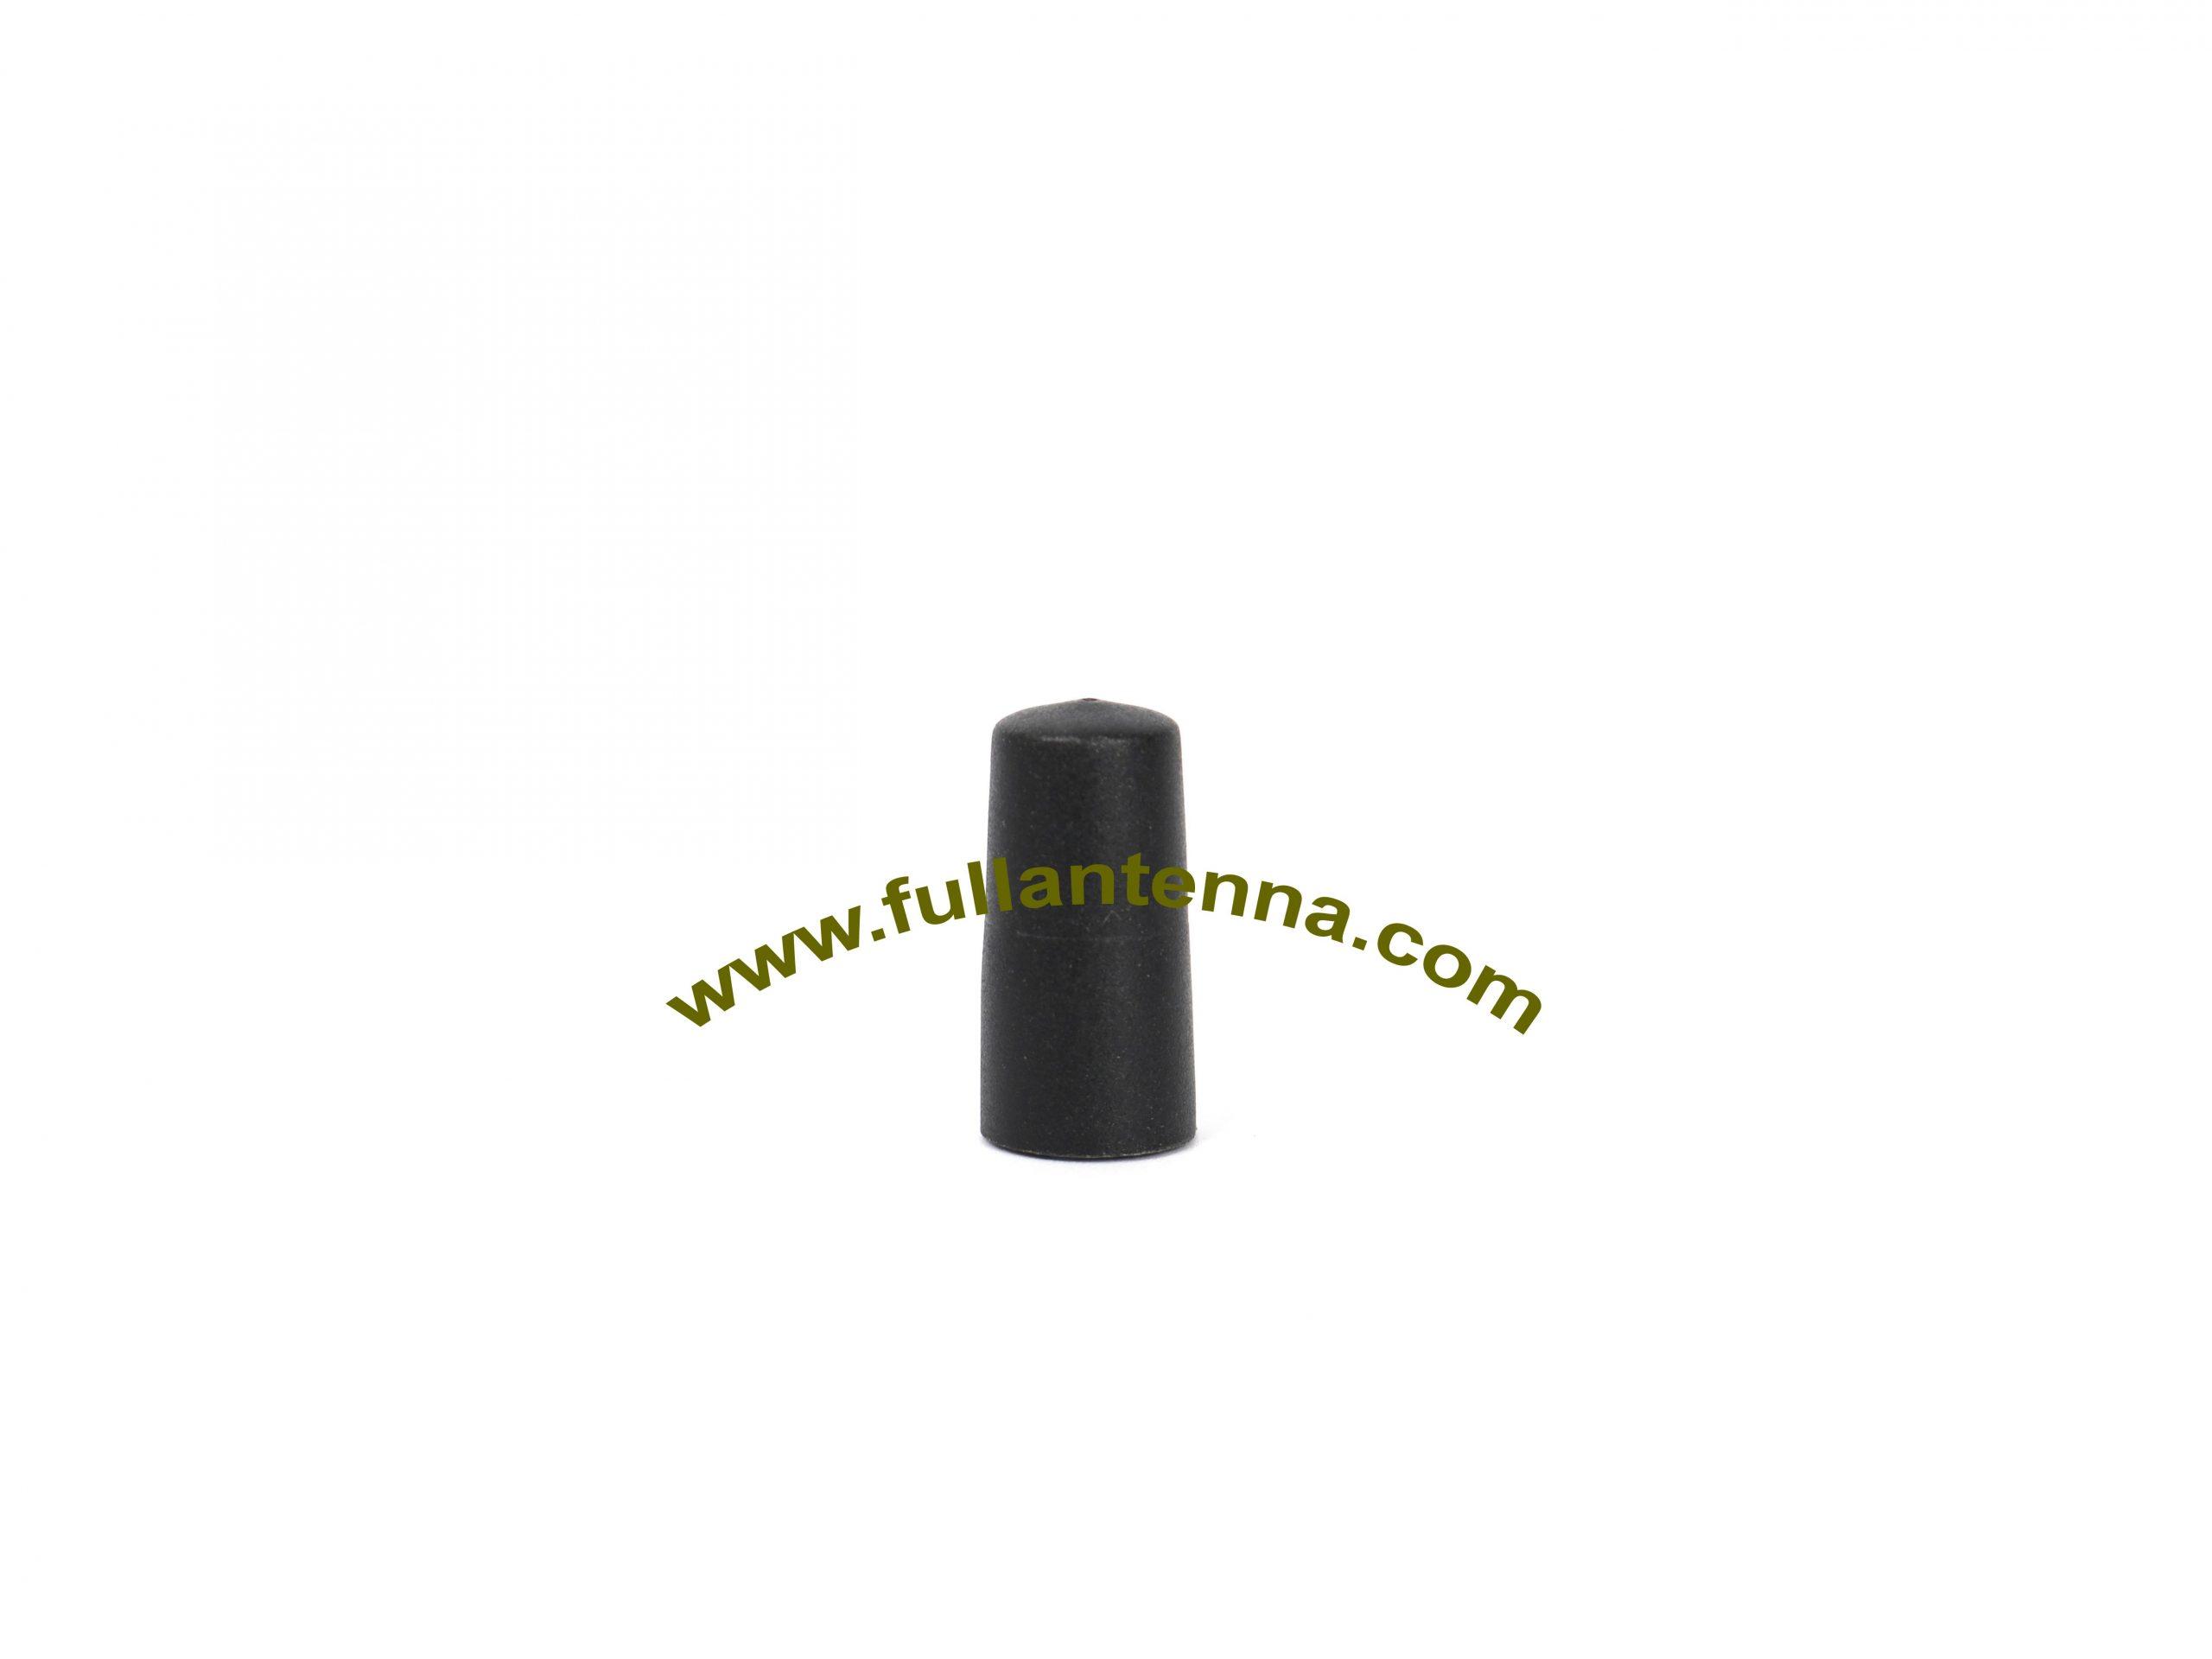 P/N:FA2400.00S1,WiFi/2.4G Rubber Antenna,antenna,very short antenna hot sale 19mm length